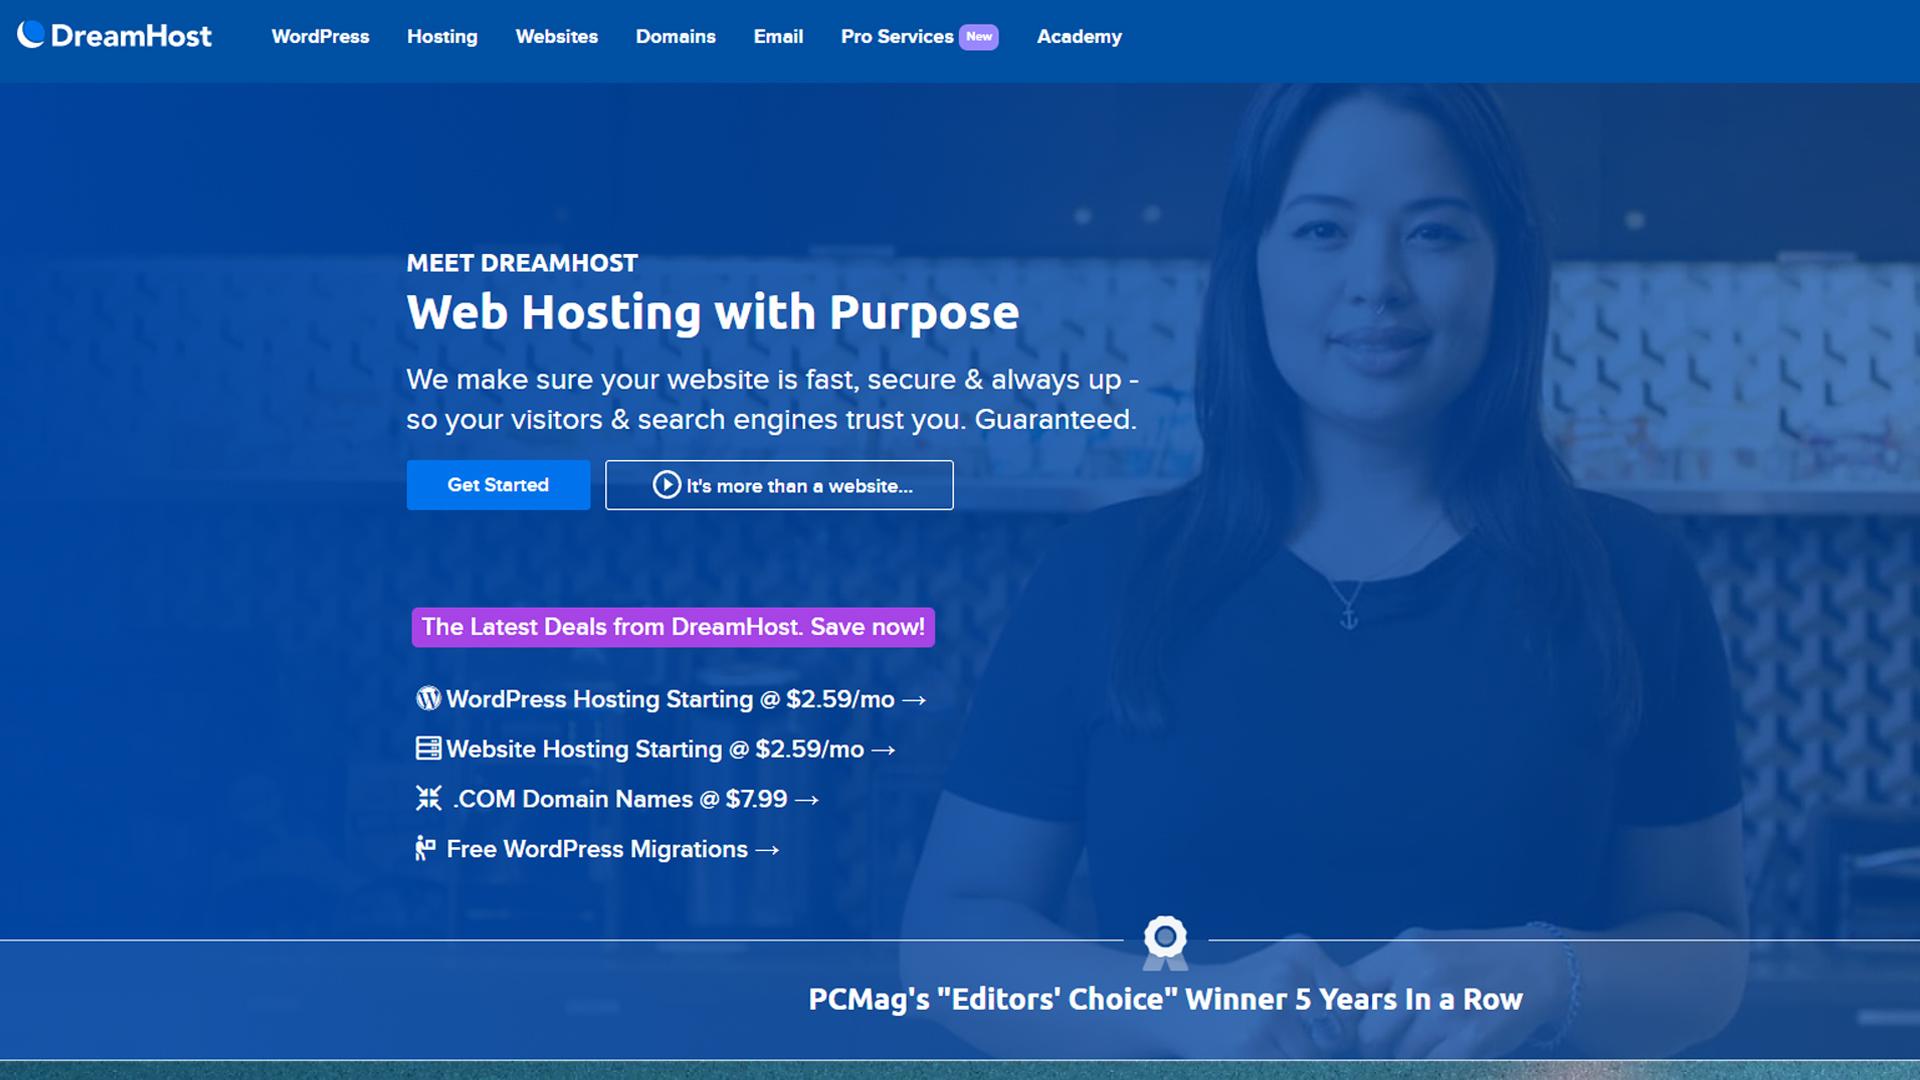 DreamHost's homepage